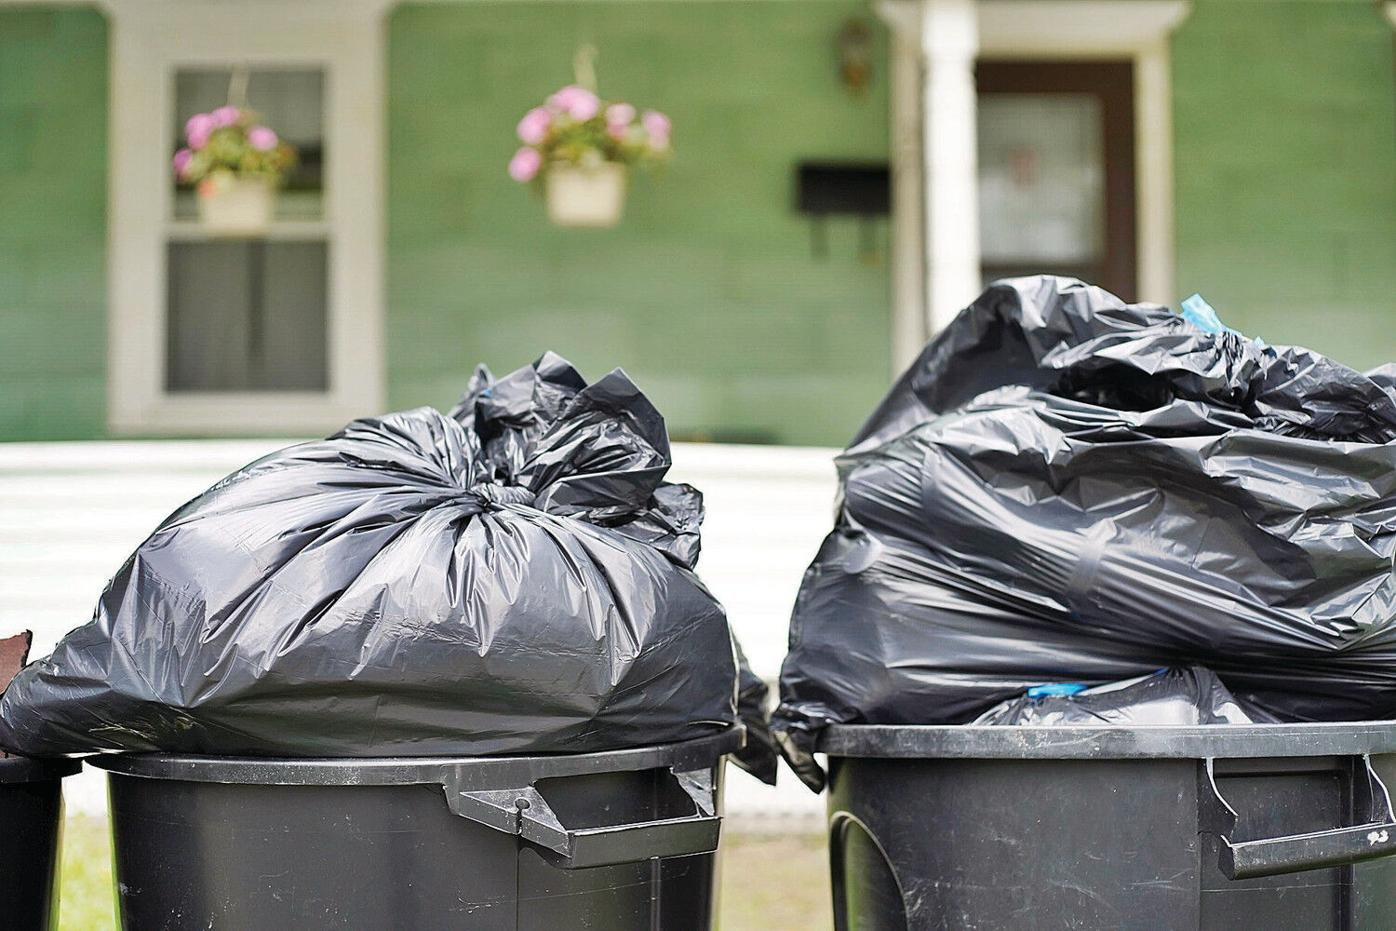 Pittsfield rolls back trash pickup protocols, citing miscommunication